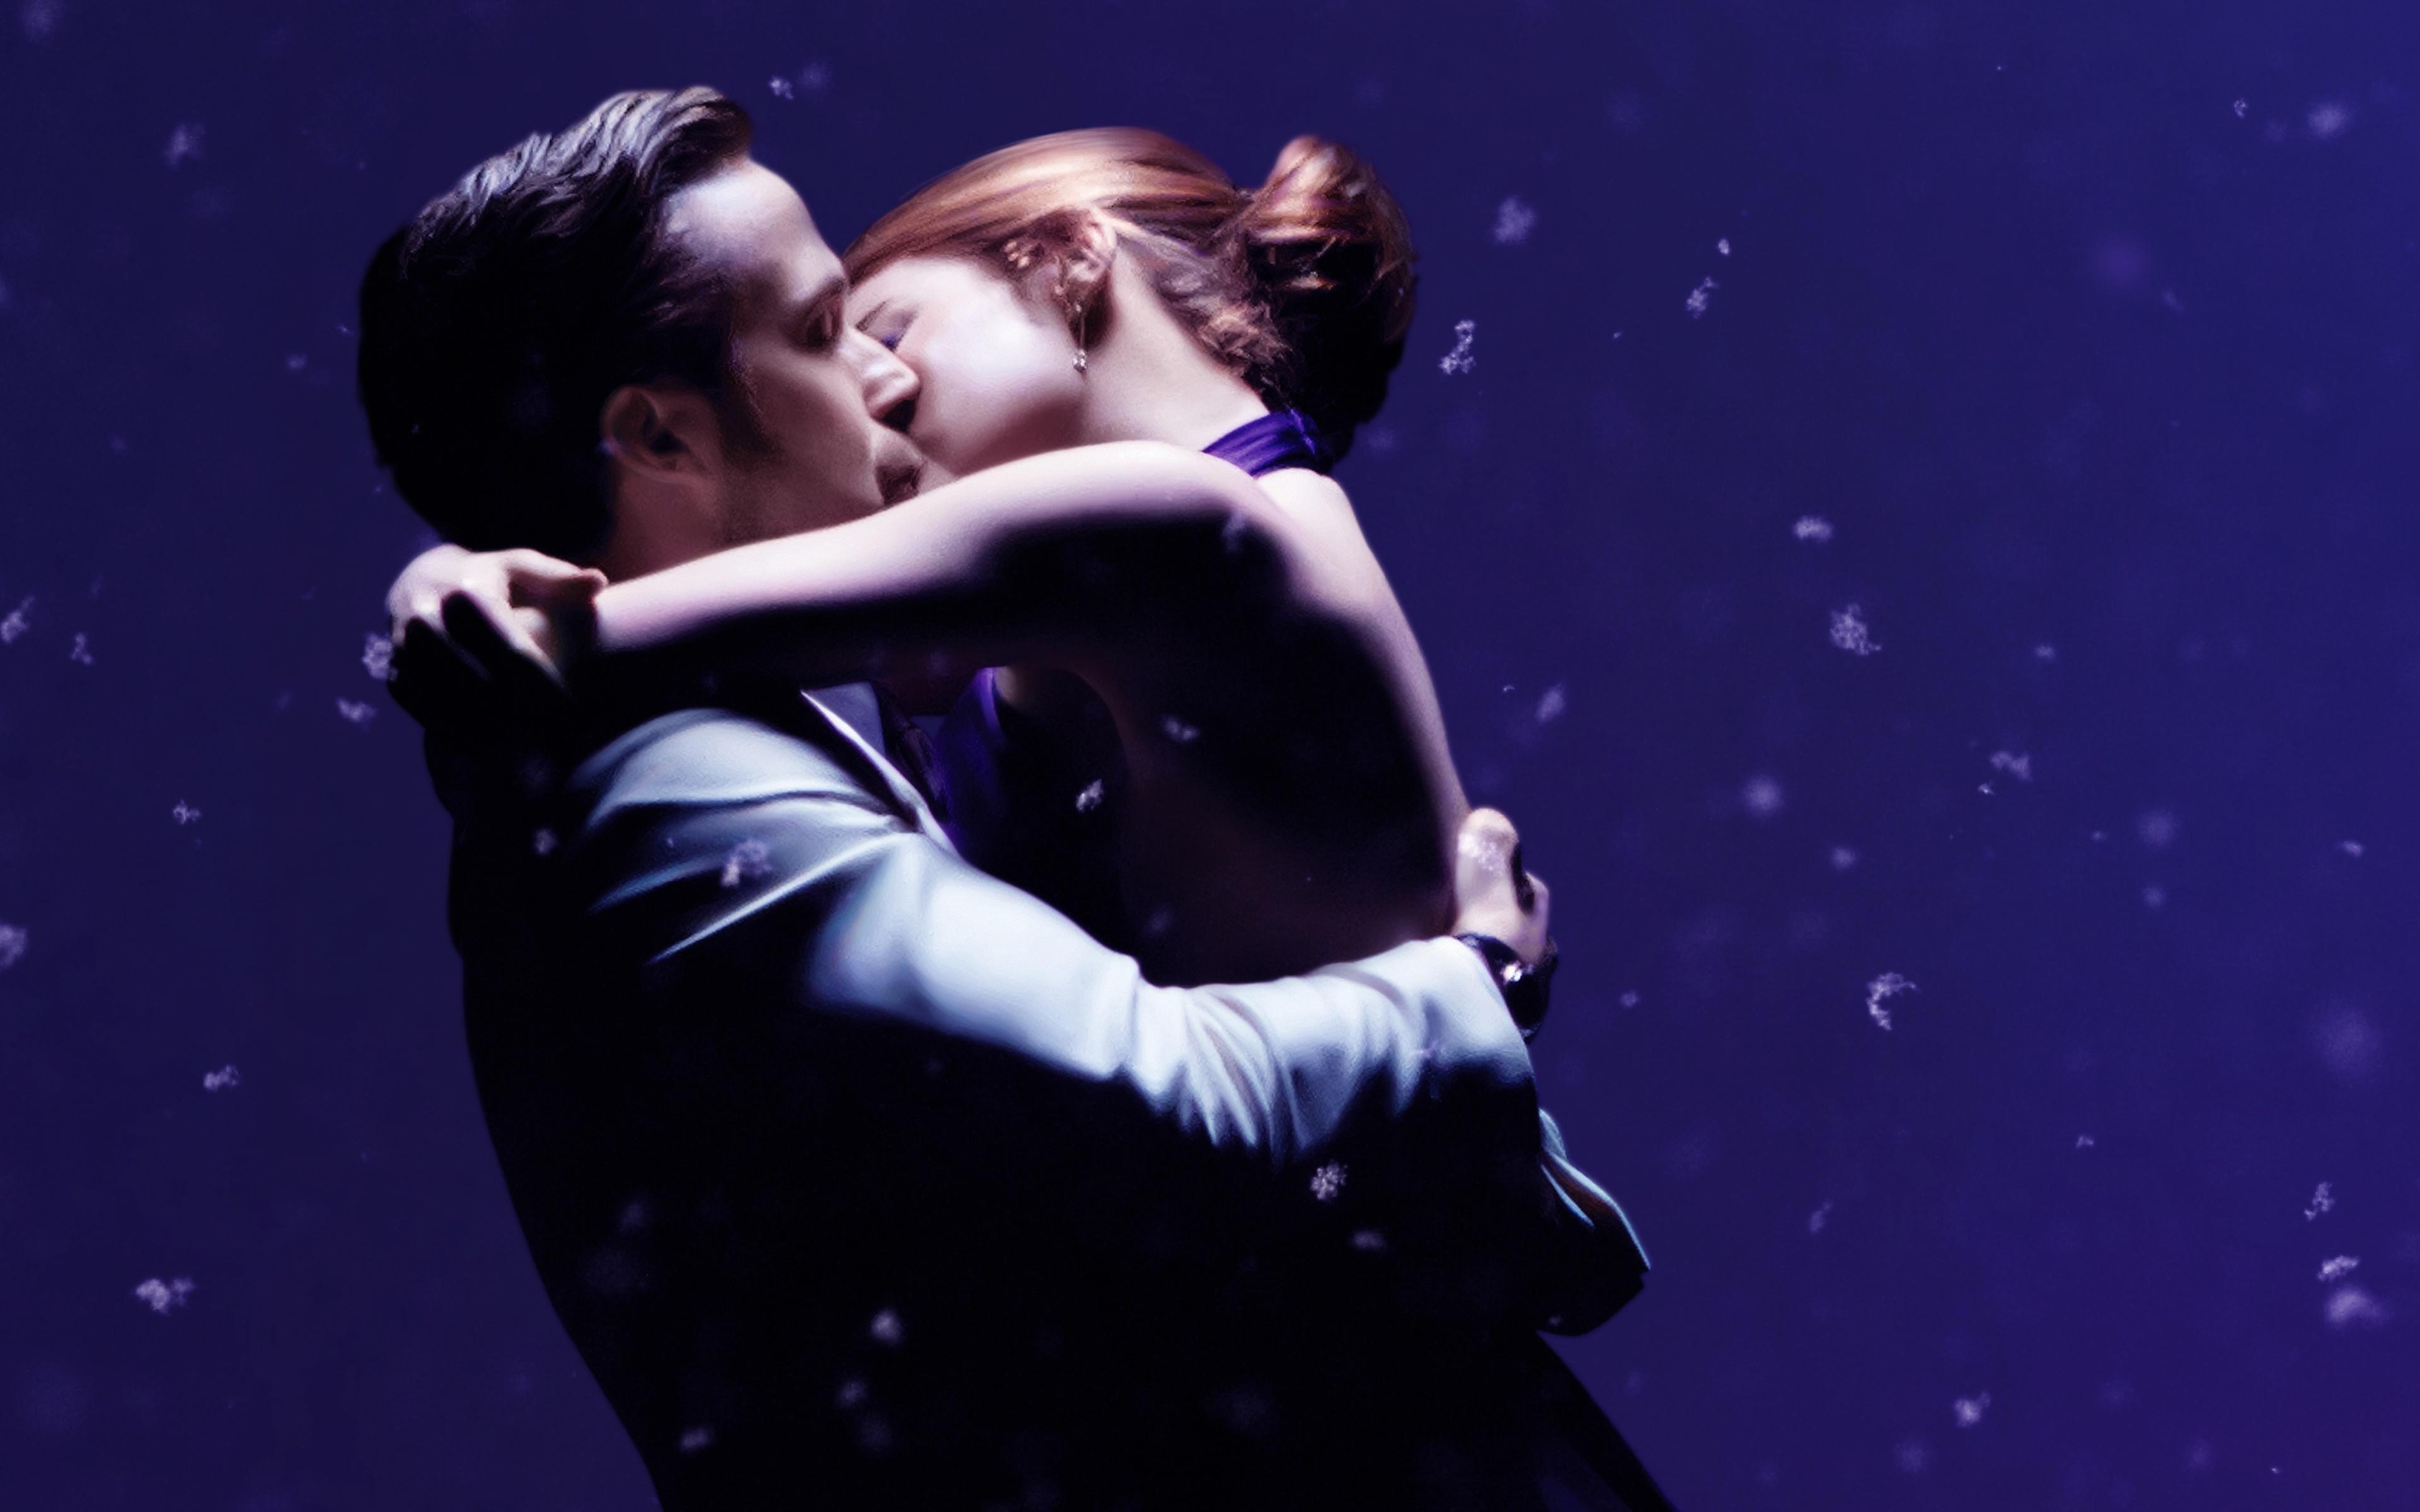 La La Land Emma Stone And Ryan Gosling Hd Movies 4k Wallpapers